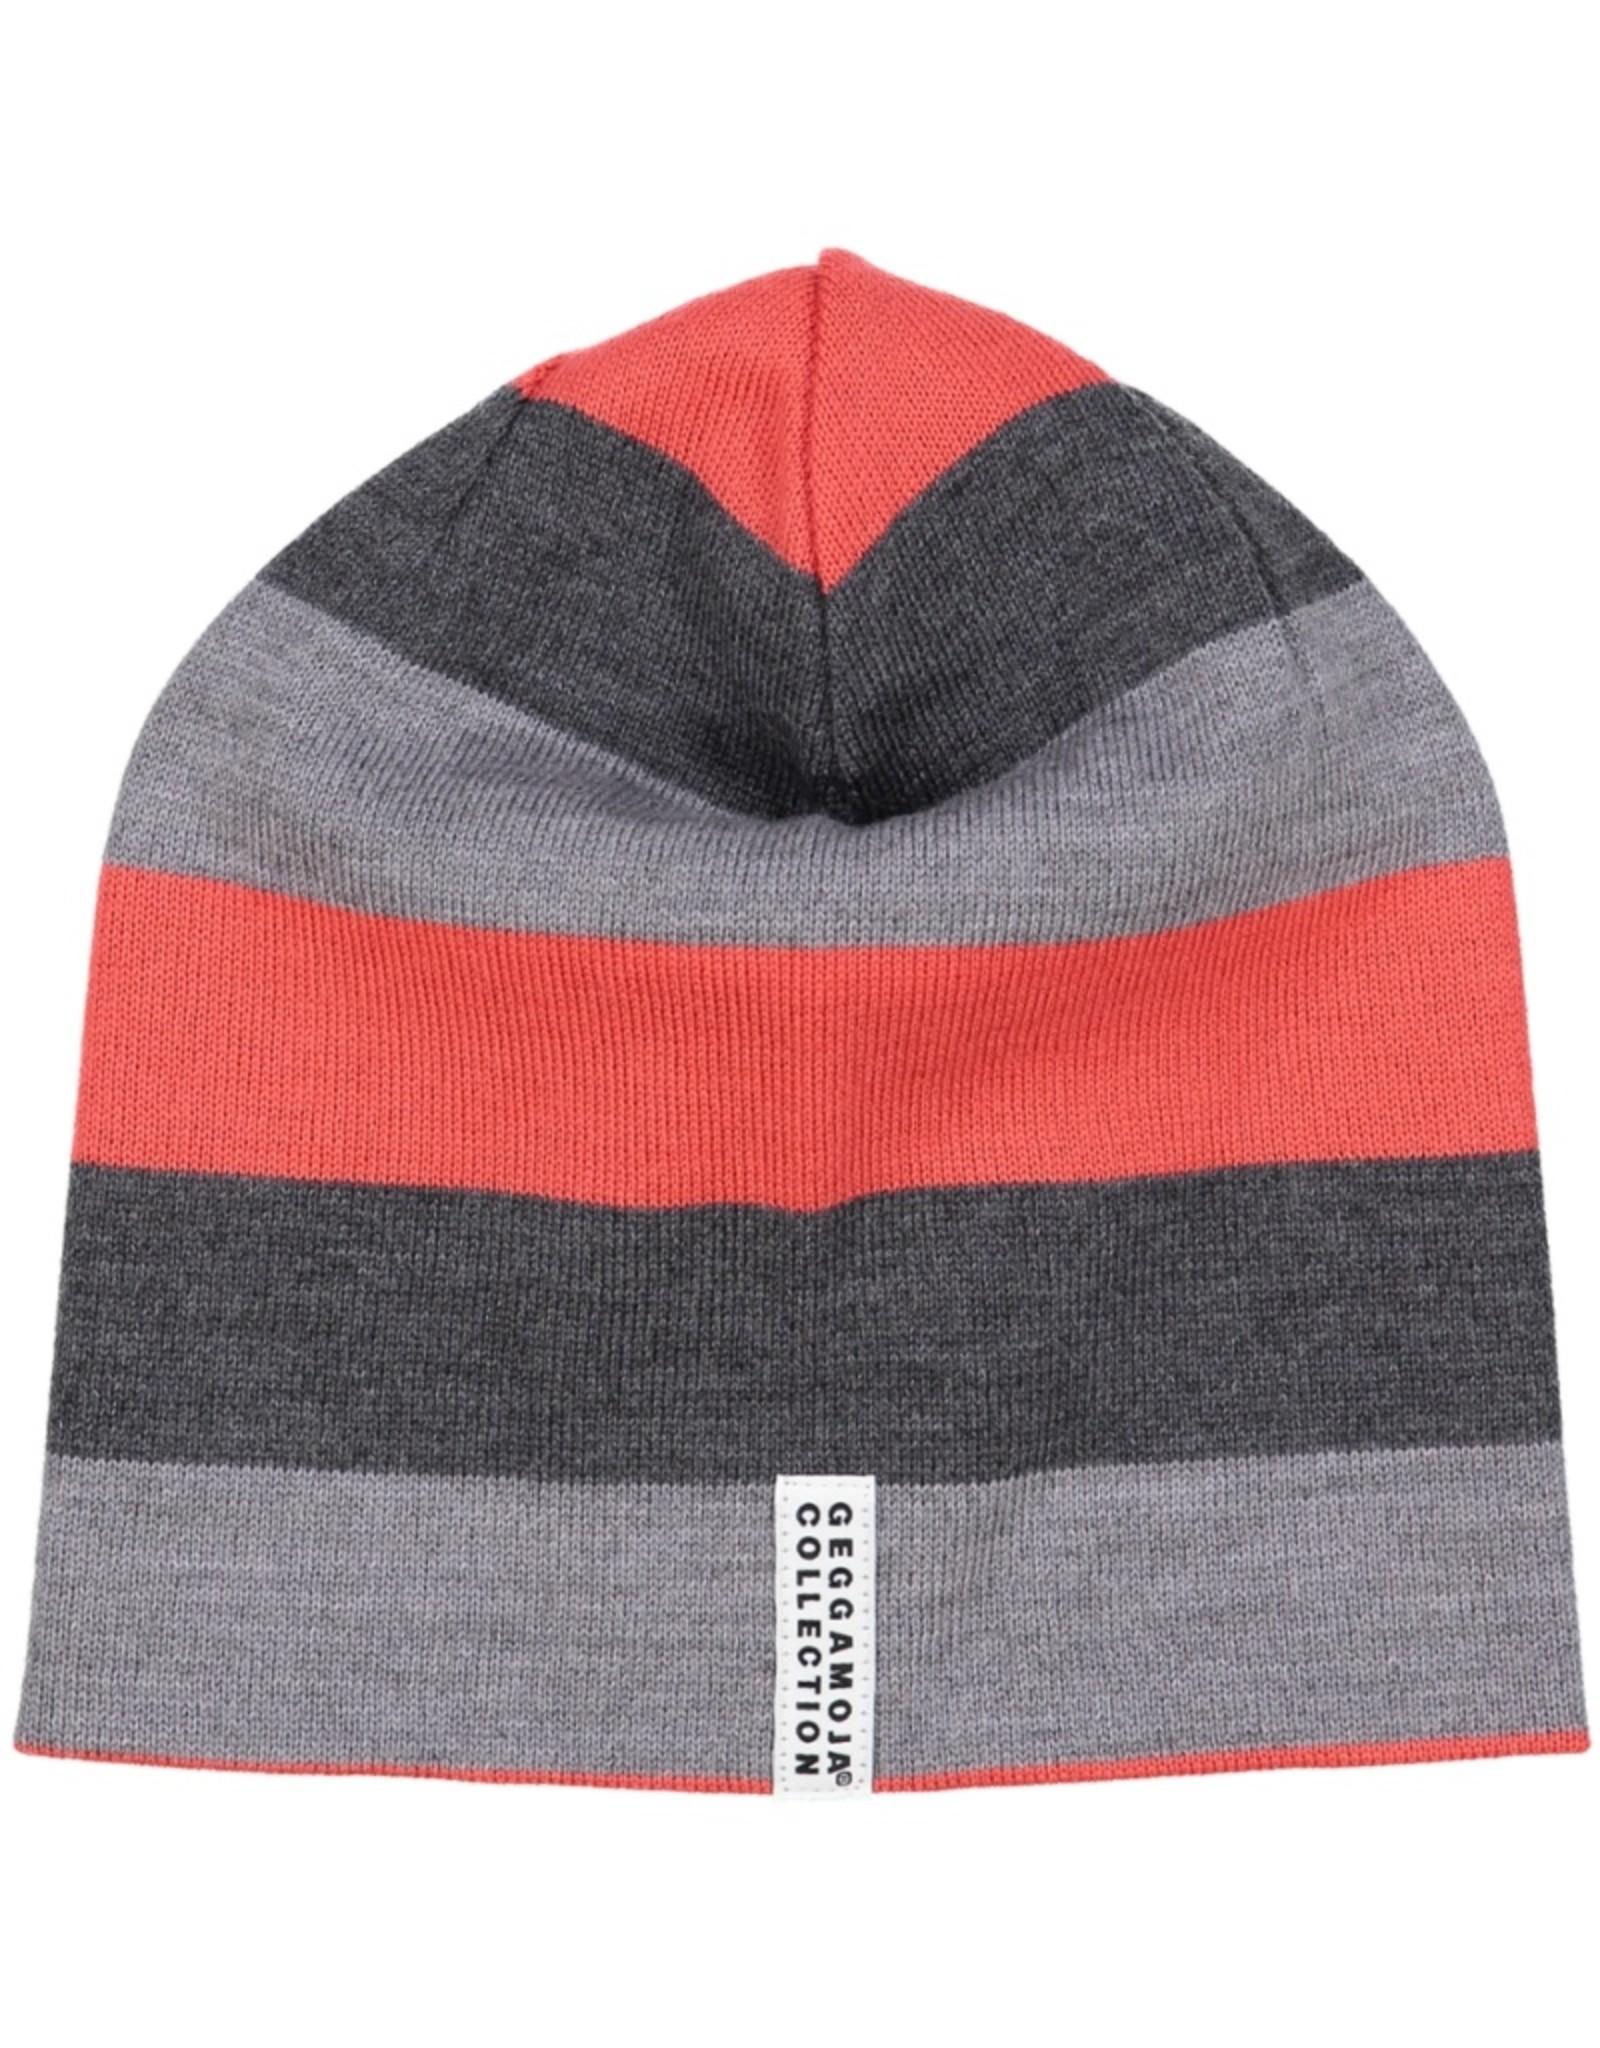 Geggamoja Woolen hat - grey red